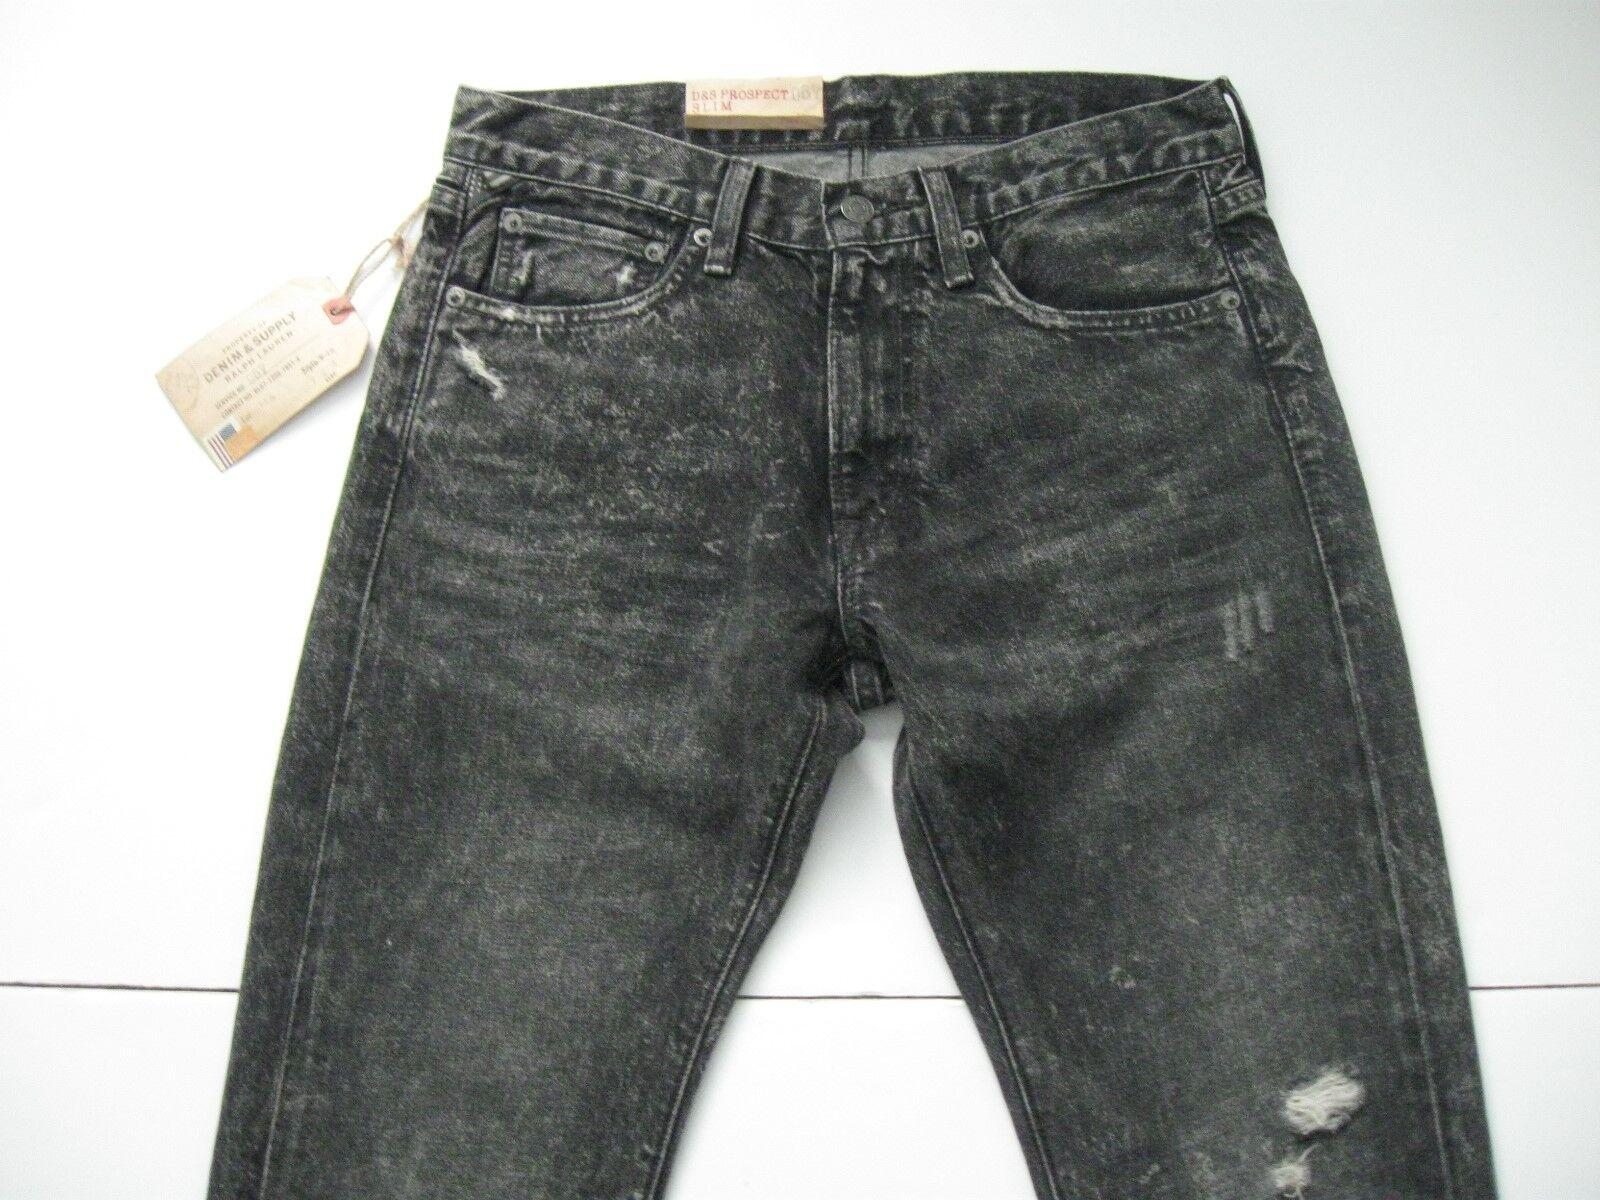 DENIM & SUPPLY RALPH LAUREN Men's Slim-Fit Acid Grey-Wash Ripped Jeans 30x32